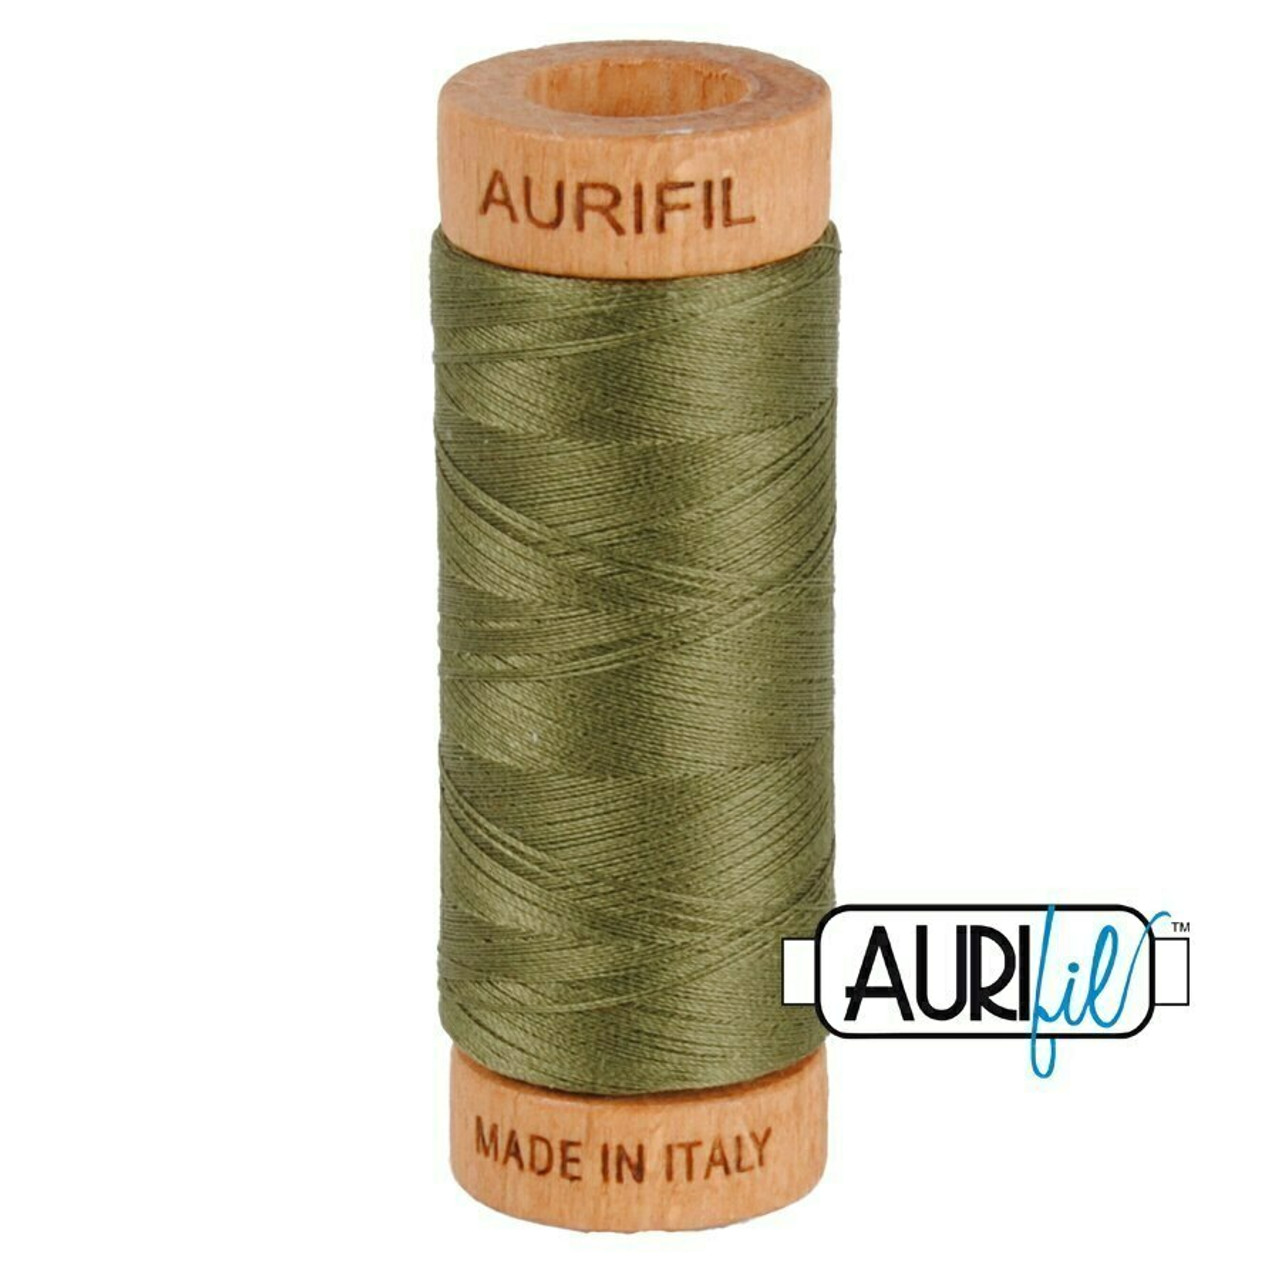 Aurifil 80wt Army Green (2905) thread